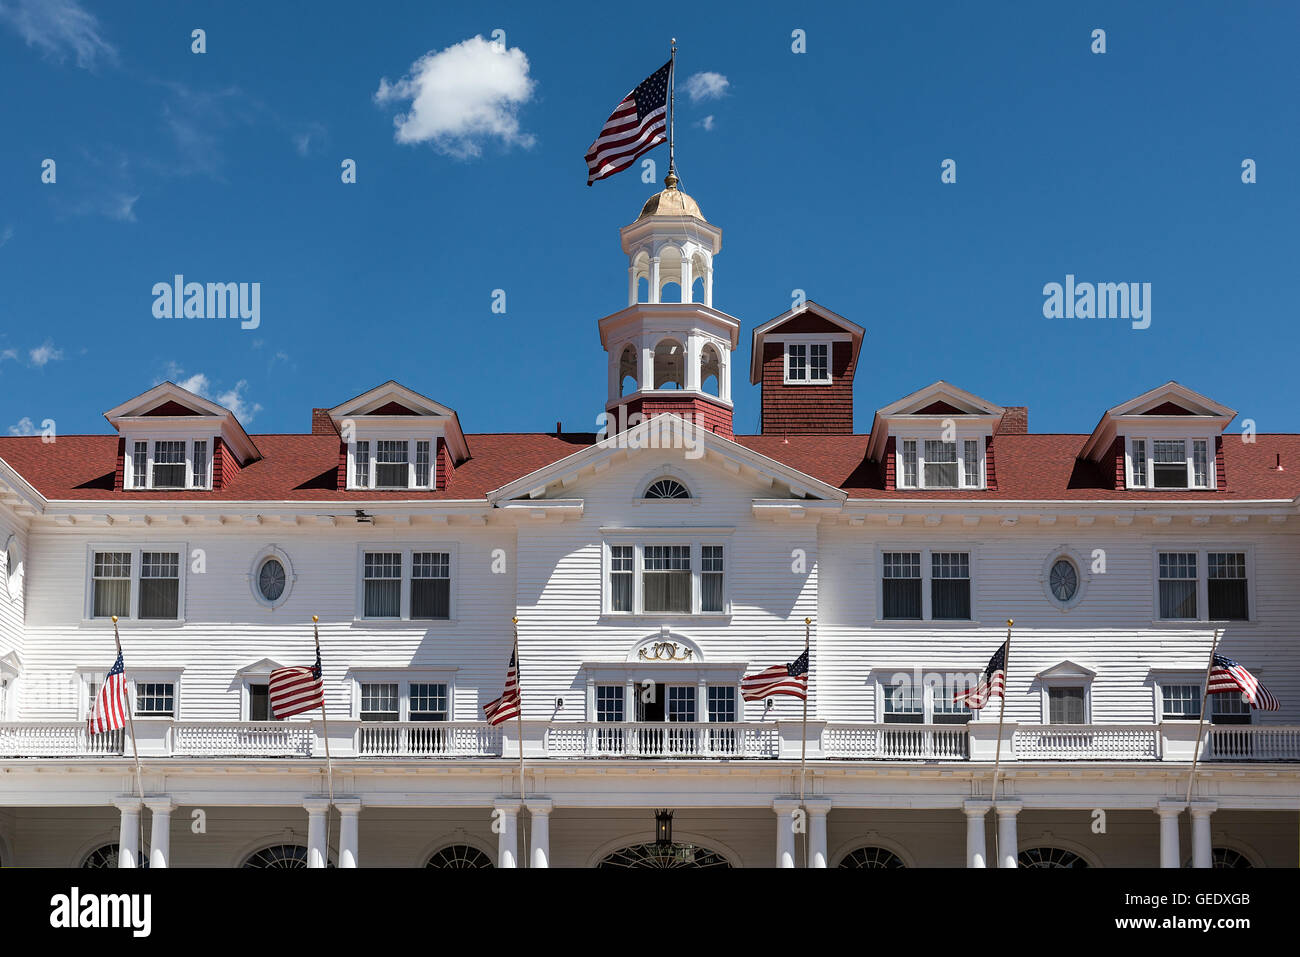 The Stanley Hotel,  Estes Park, Colorado, USA - Stock Image